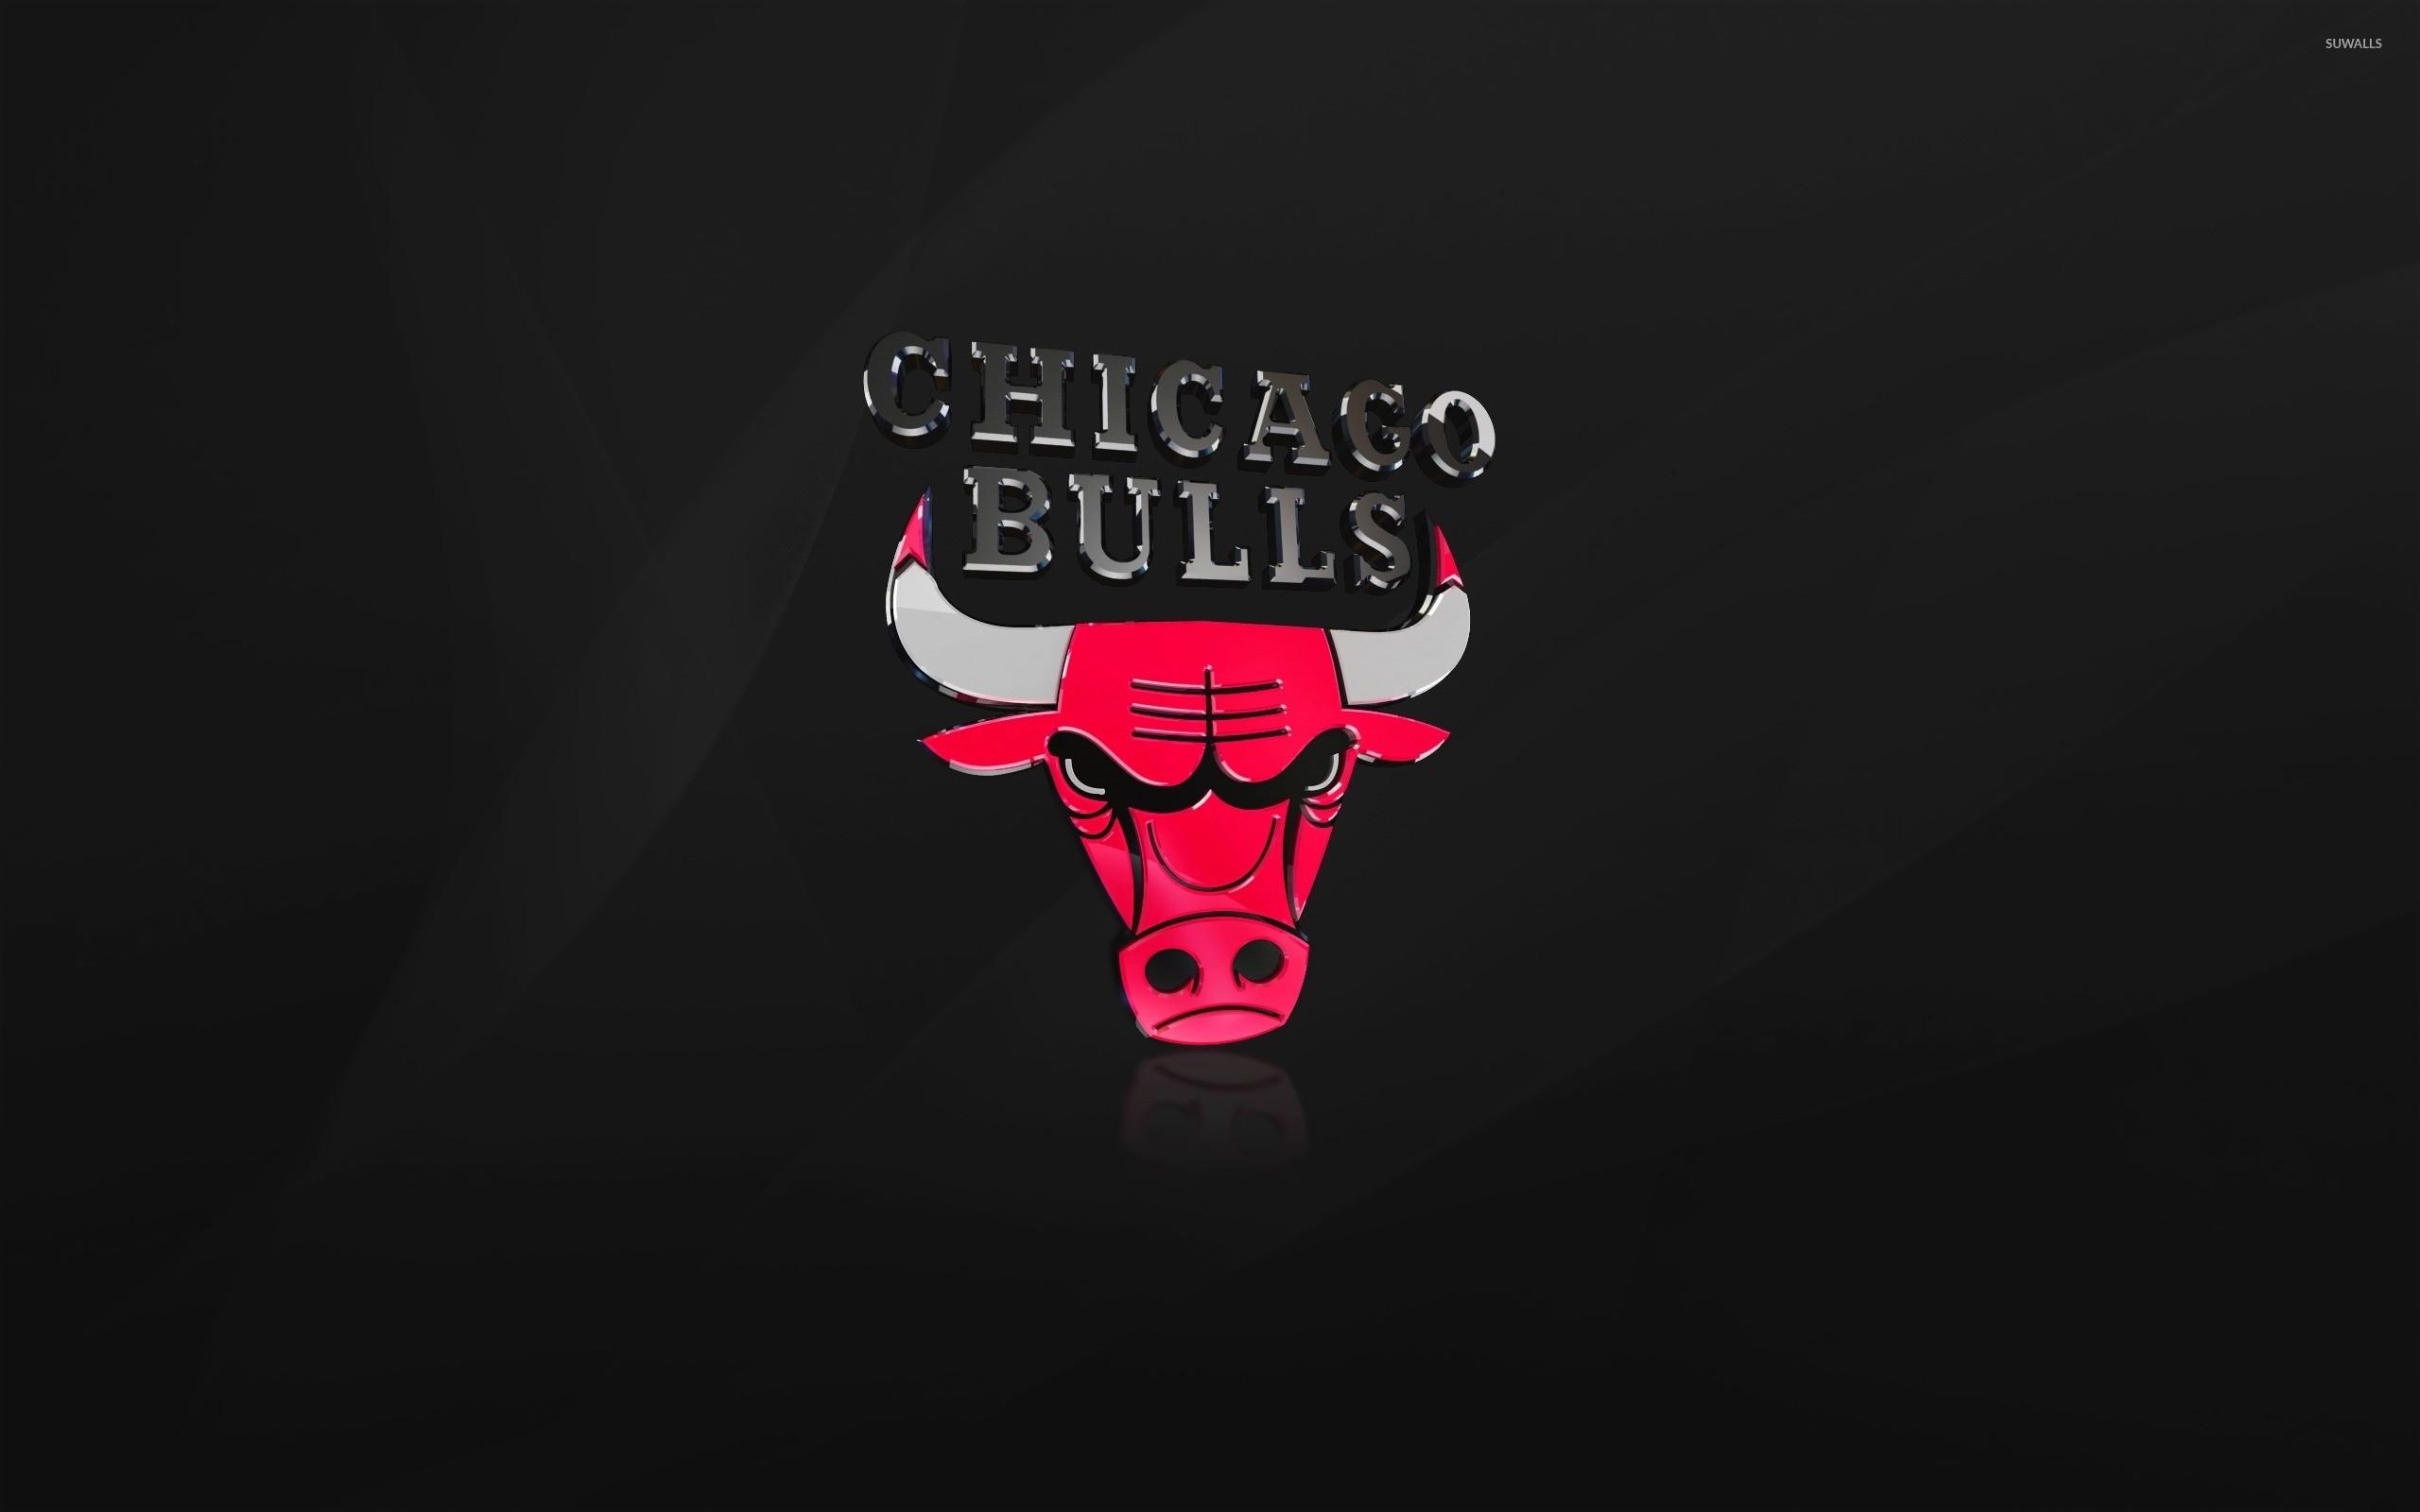 Shiny Chicago Bulls logo wallpaper